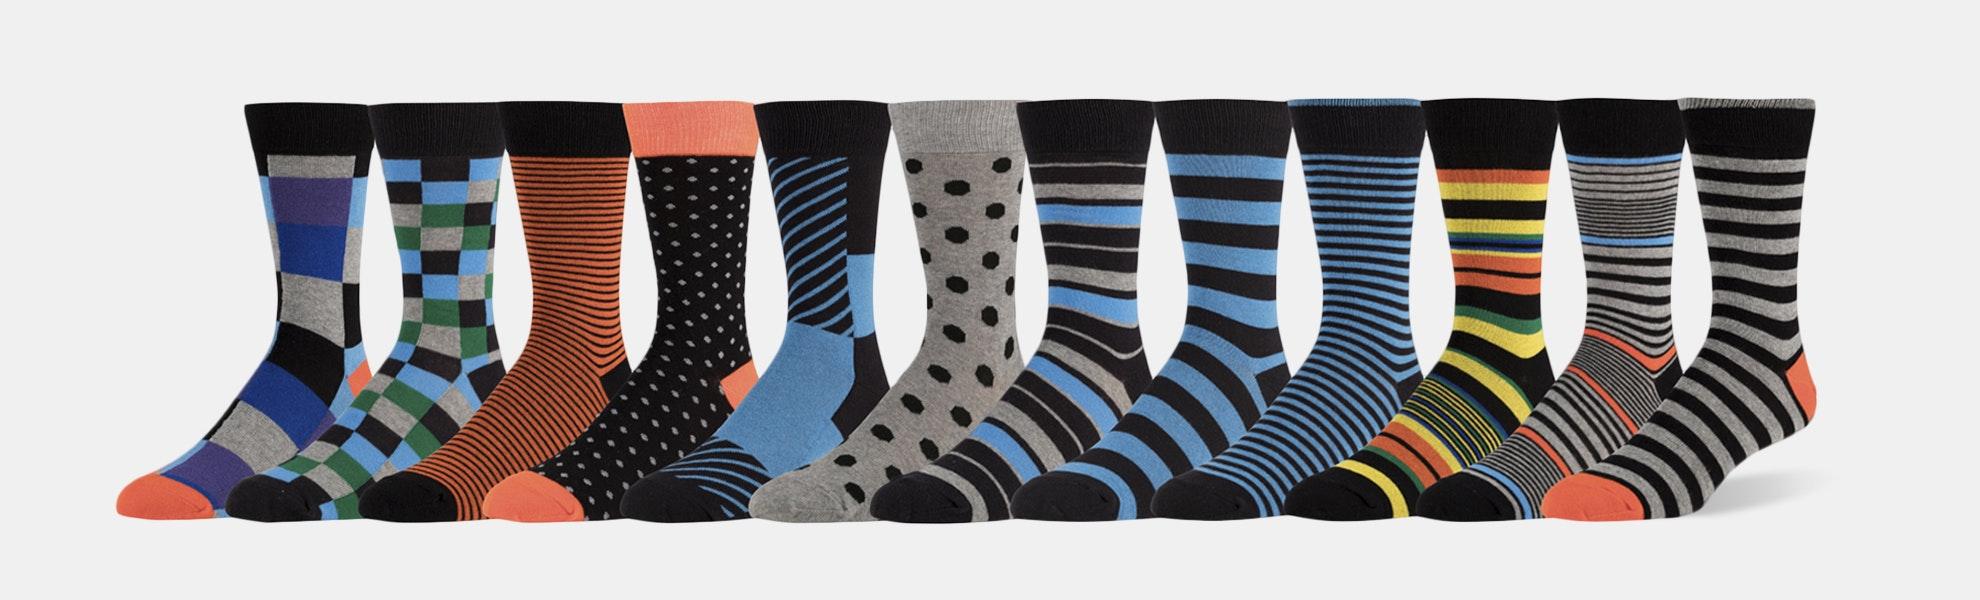 ZEKE Assorted Cotton Blend Dress Socks (12-Pack)